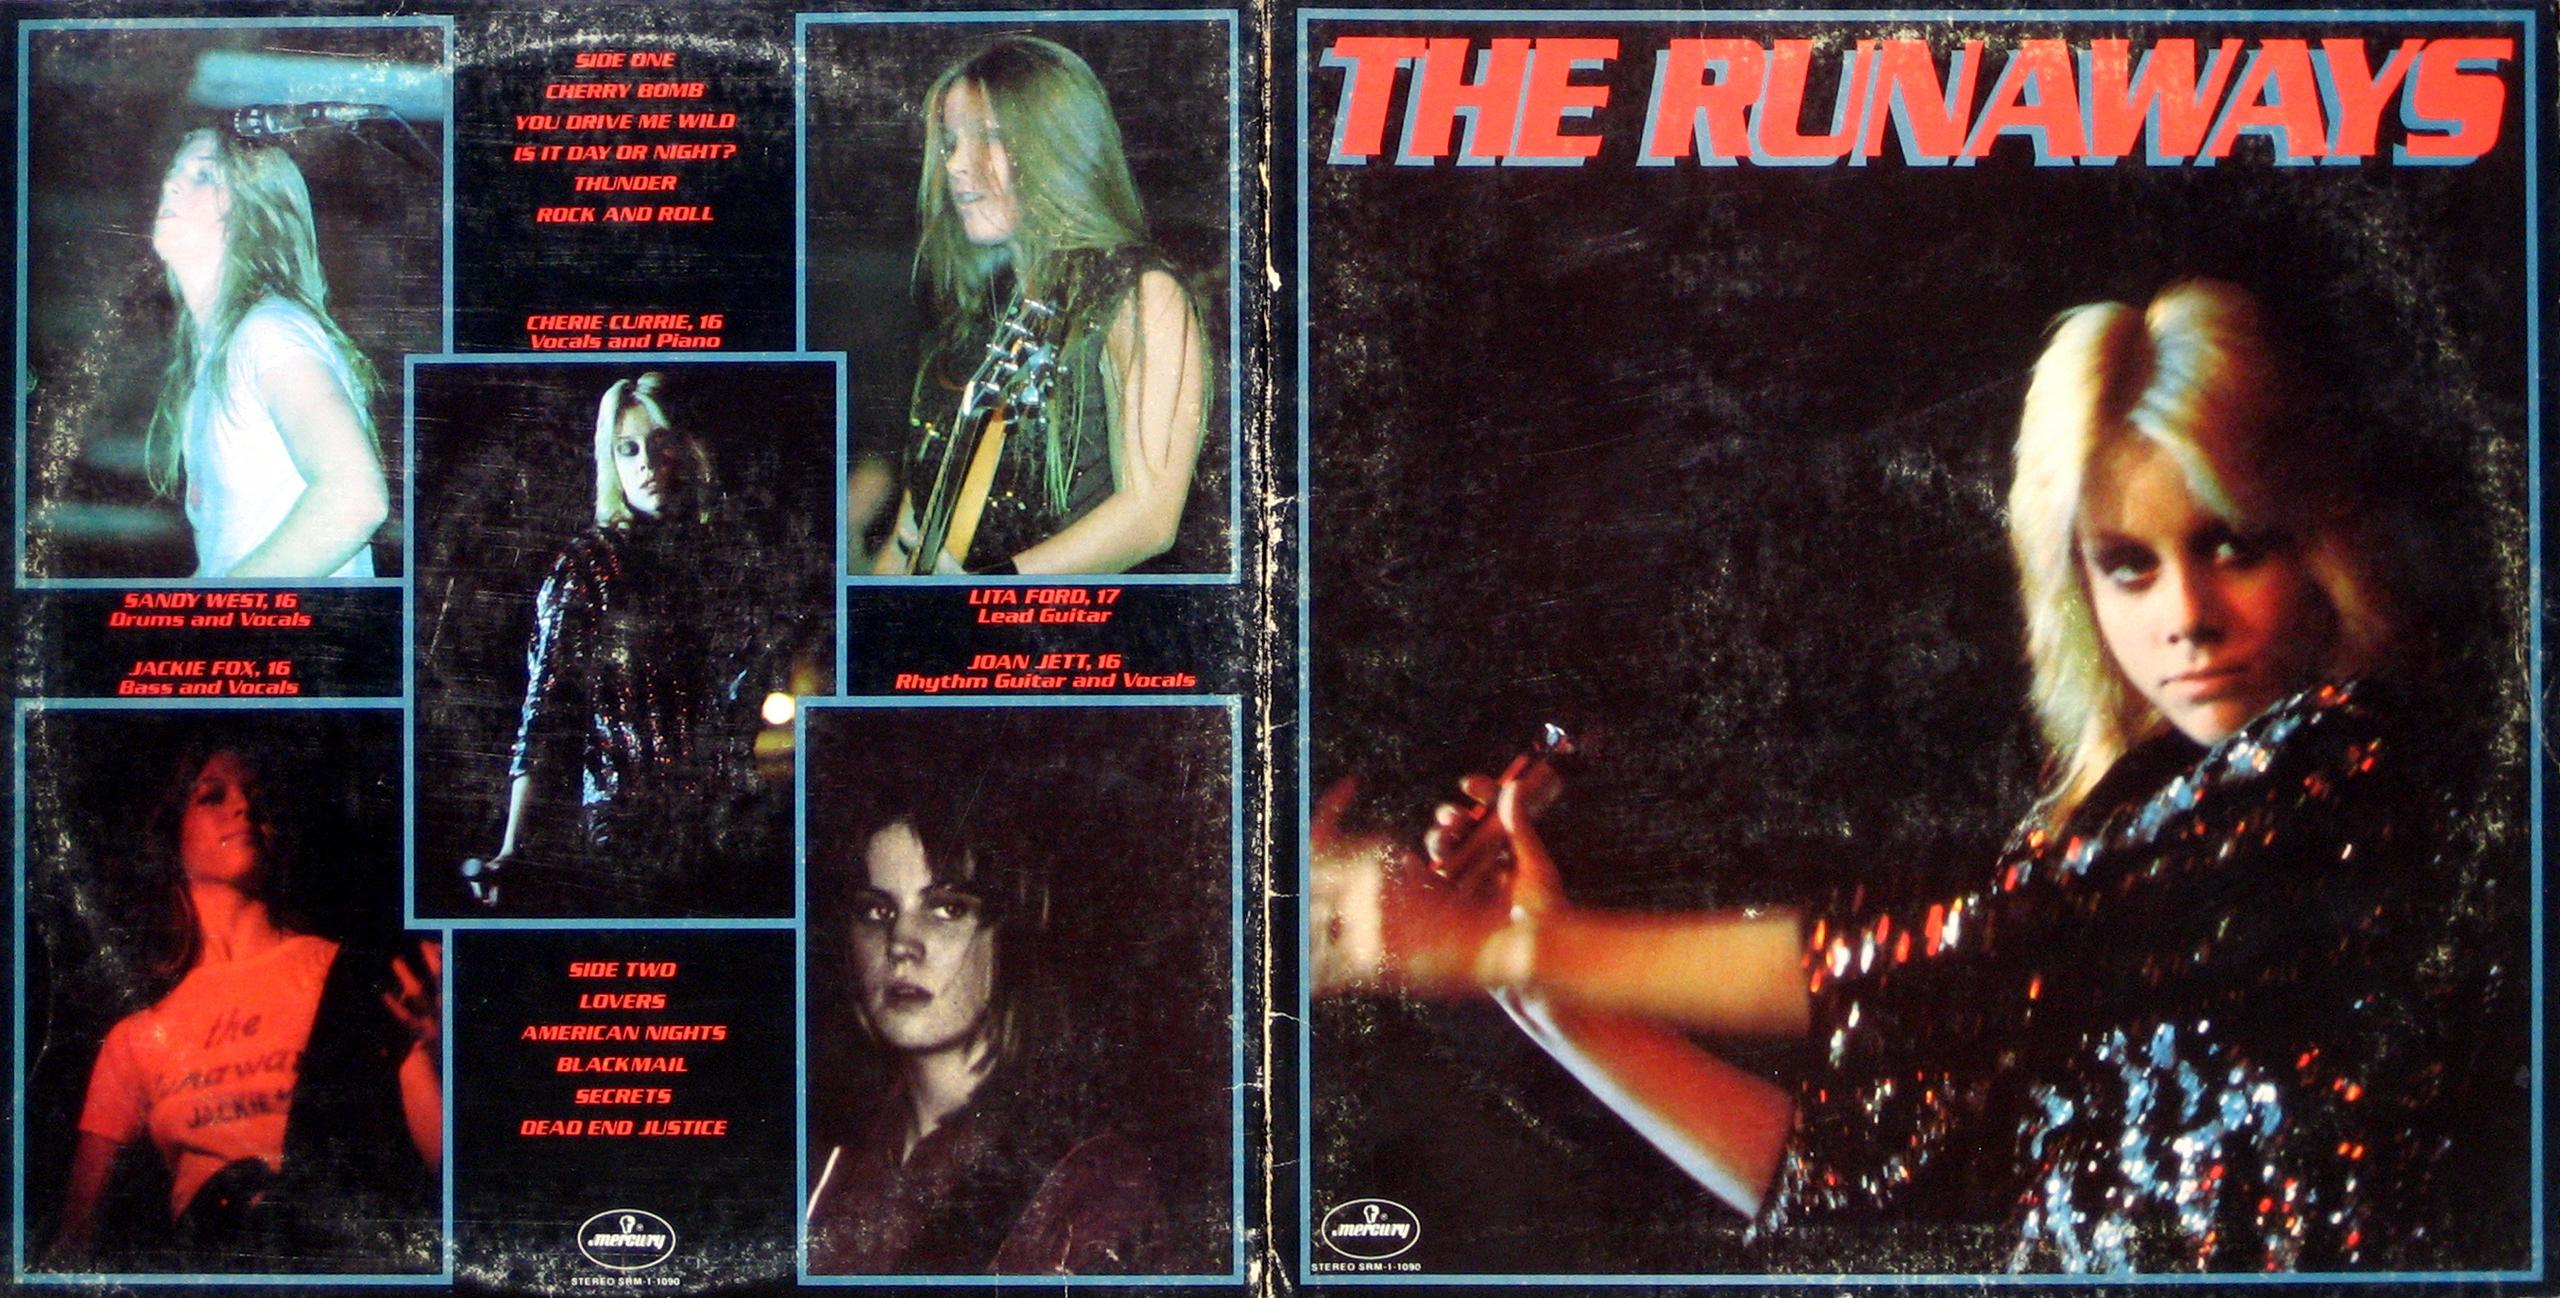 The-Runaways-the-runaways-9473610-2560-1298.jpg